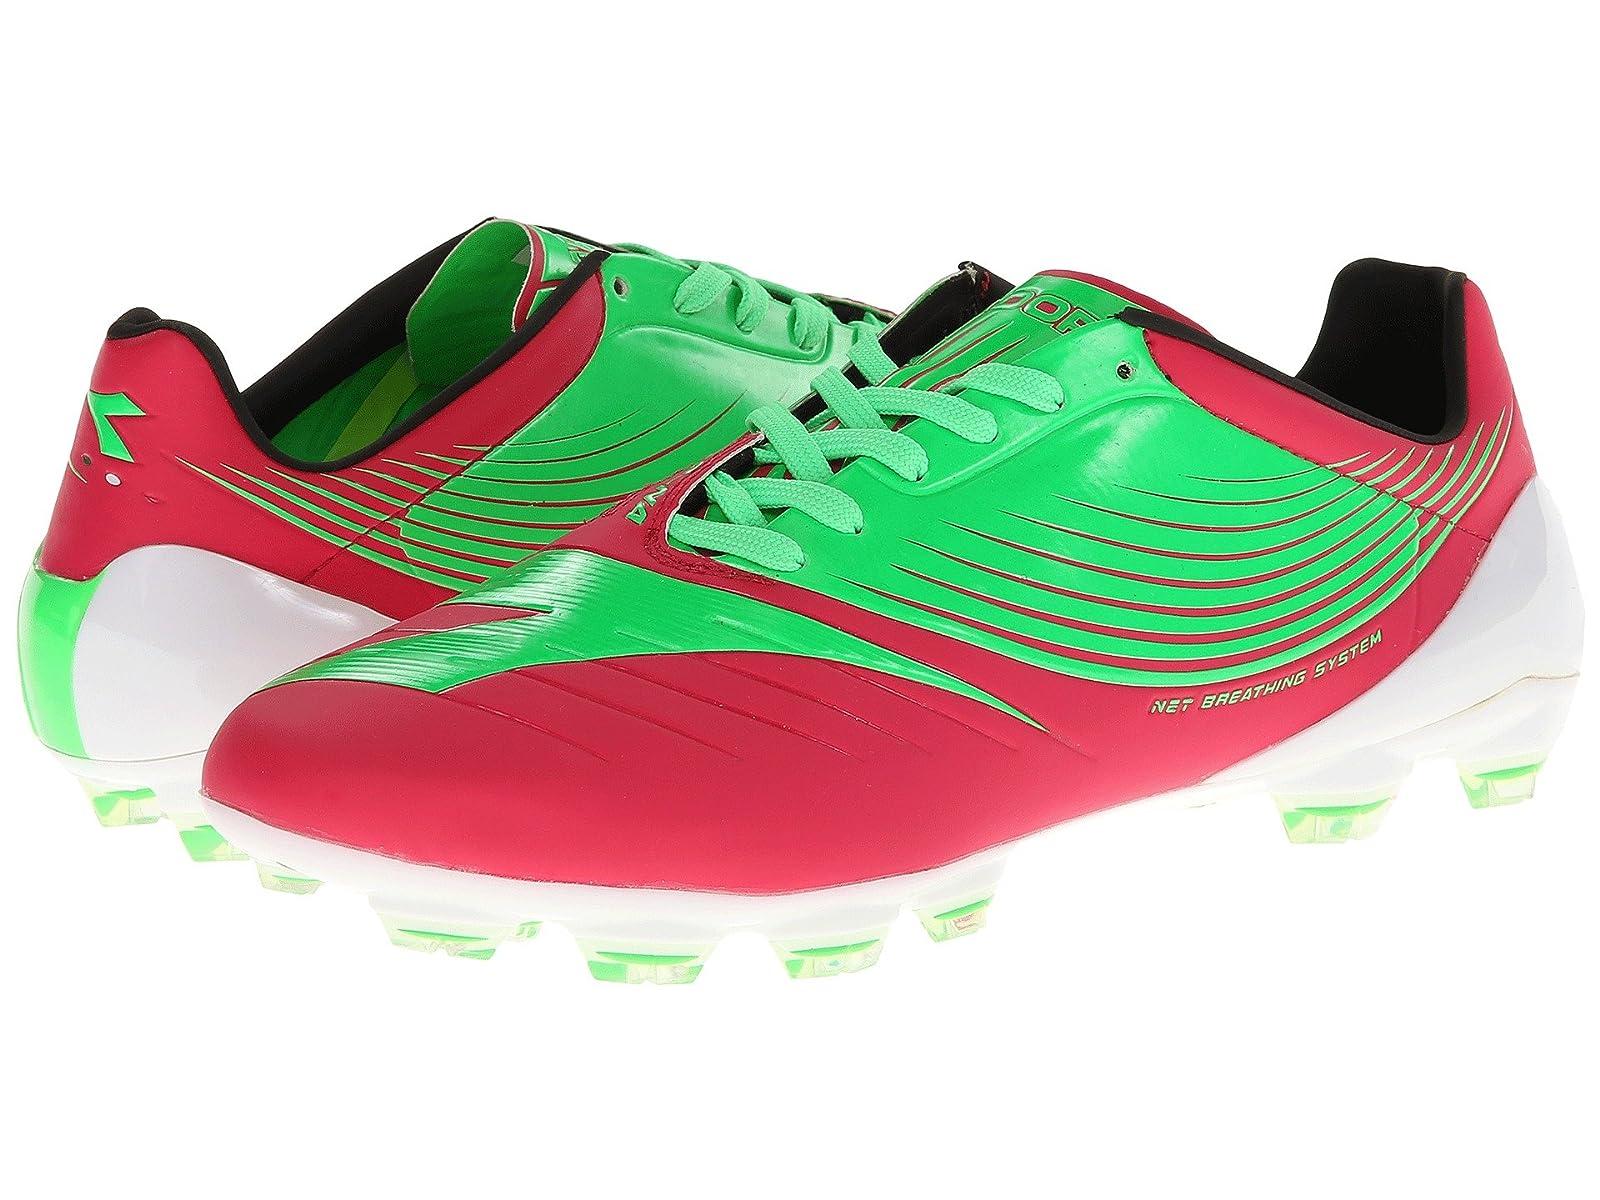 Diadora DD-NA-GLX14Cheap and distinctive eye-catching shoes